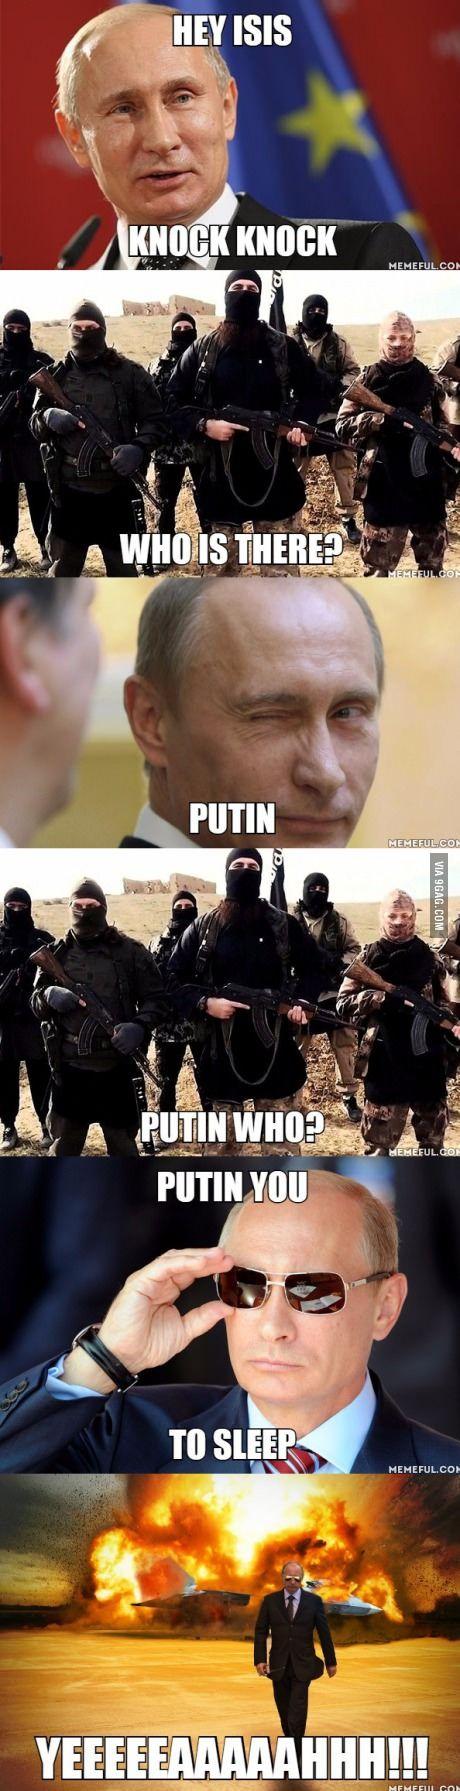 Original and creative title that describes Putin's badassery: